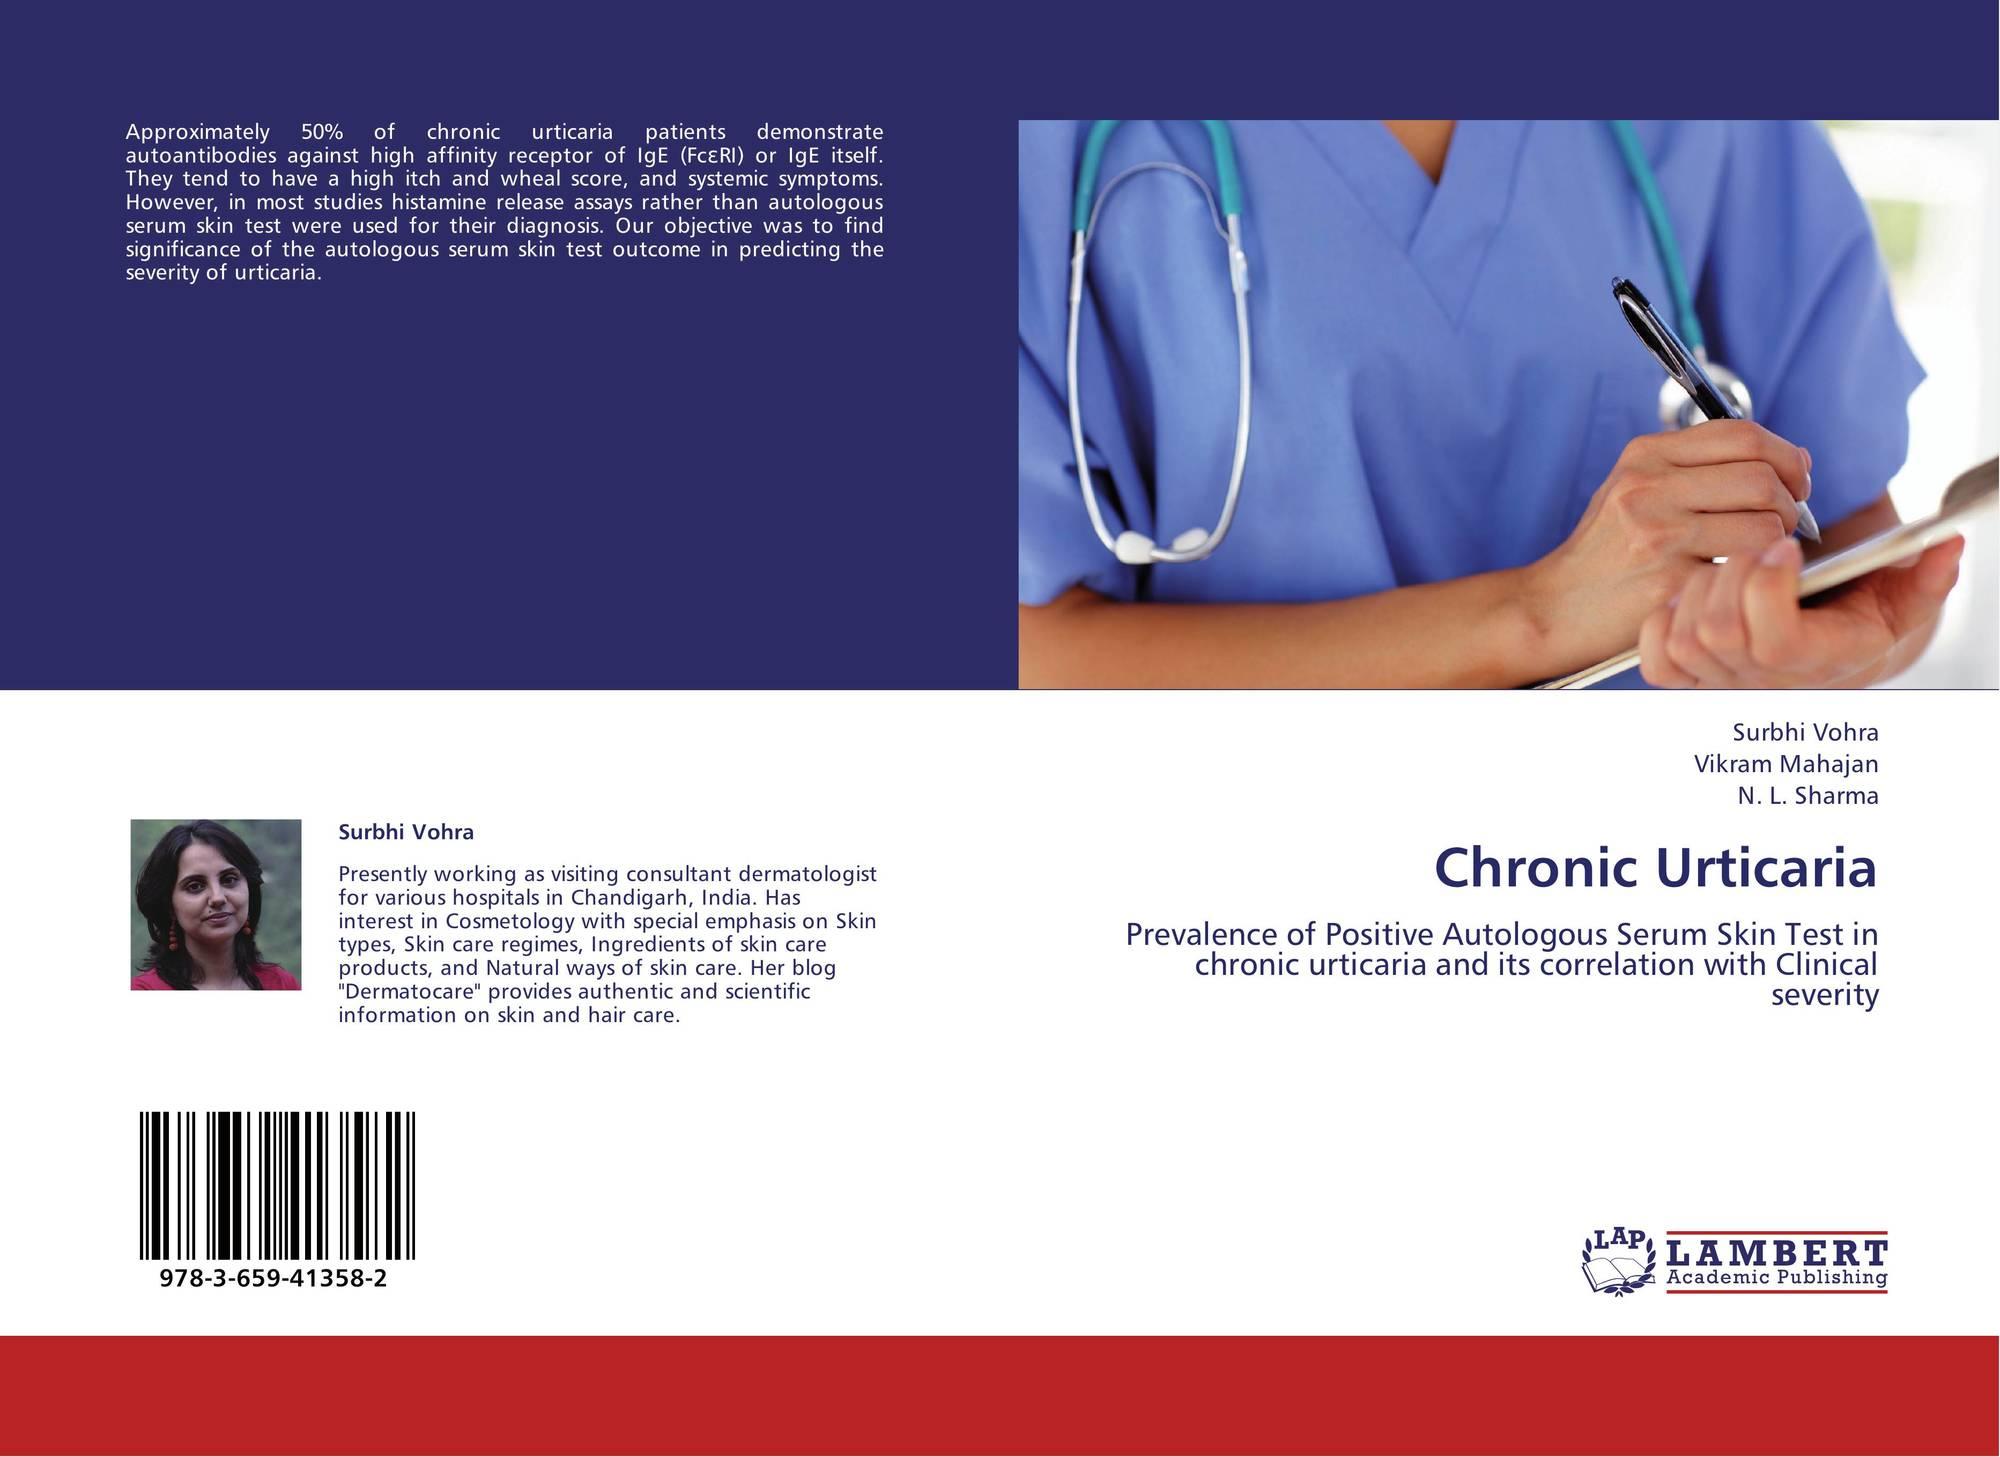 Chronic Urticaria, 978-3-659-41358-2, 3659413585